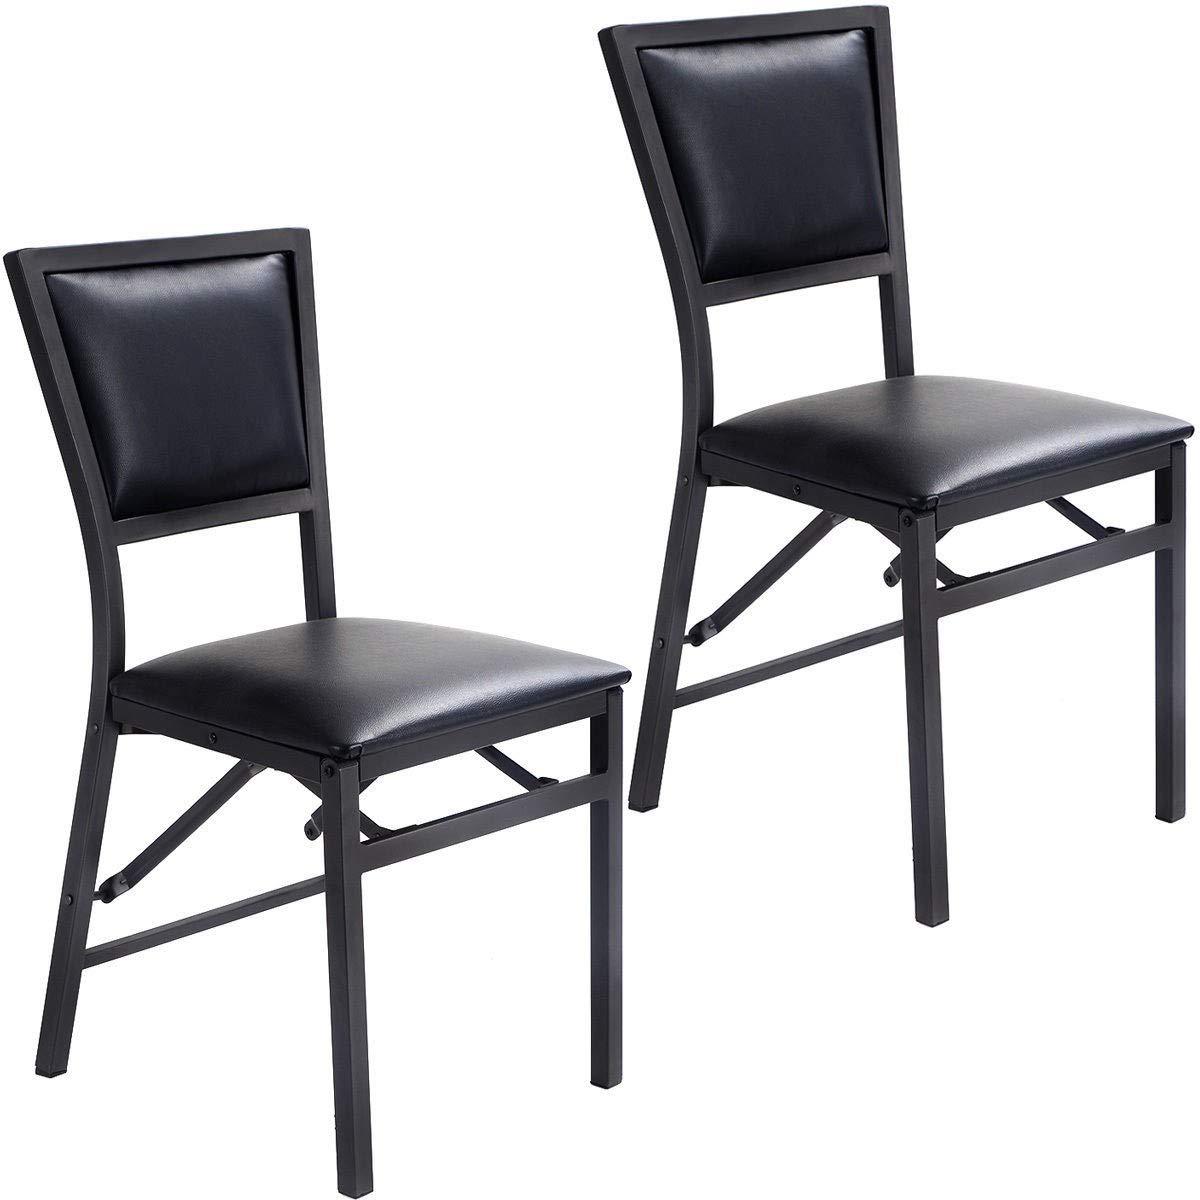 Sensational Amazon Com Set Of 2 Metal Folding Chair Dining Chairs New Ibusinesslaw Wood Chair Design Ideas Ibusinesslaworg